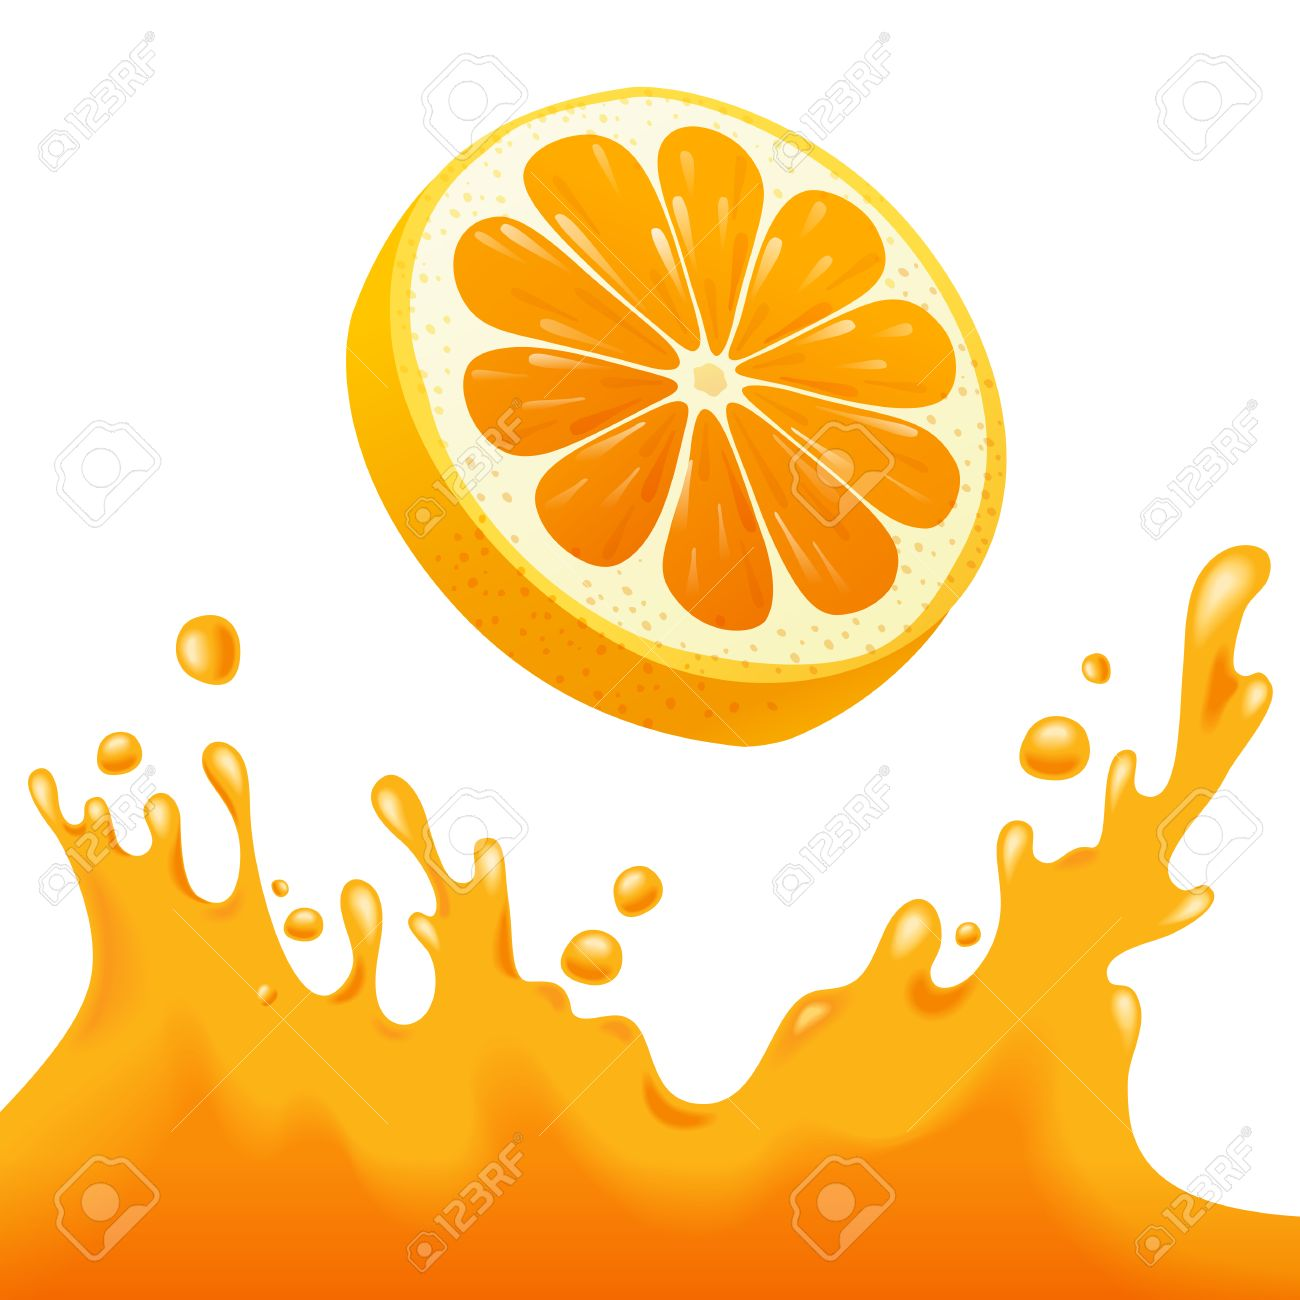 bright background with orange and orange juice splash royalty free rh 123rf com